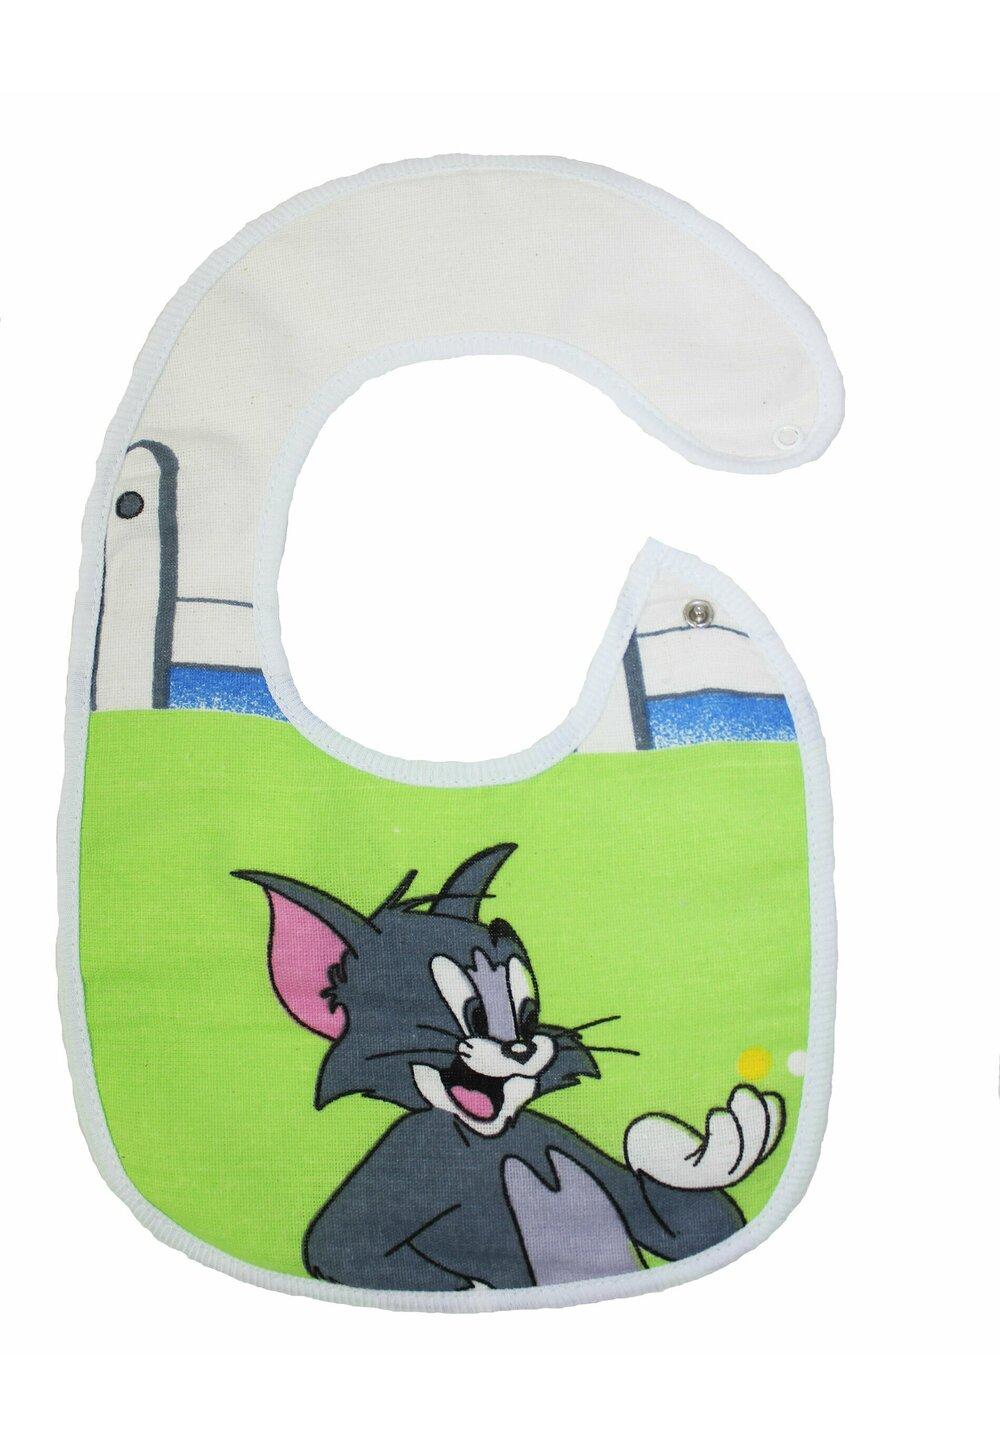 Baveta bebe, Tom , 0-6 luni imagine